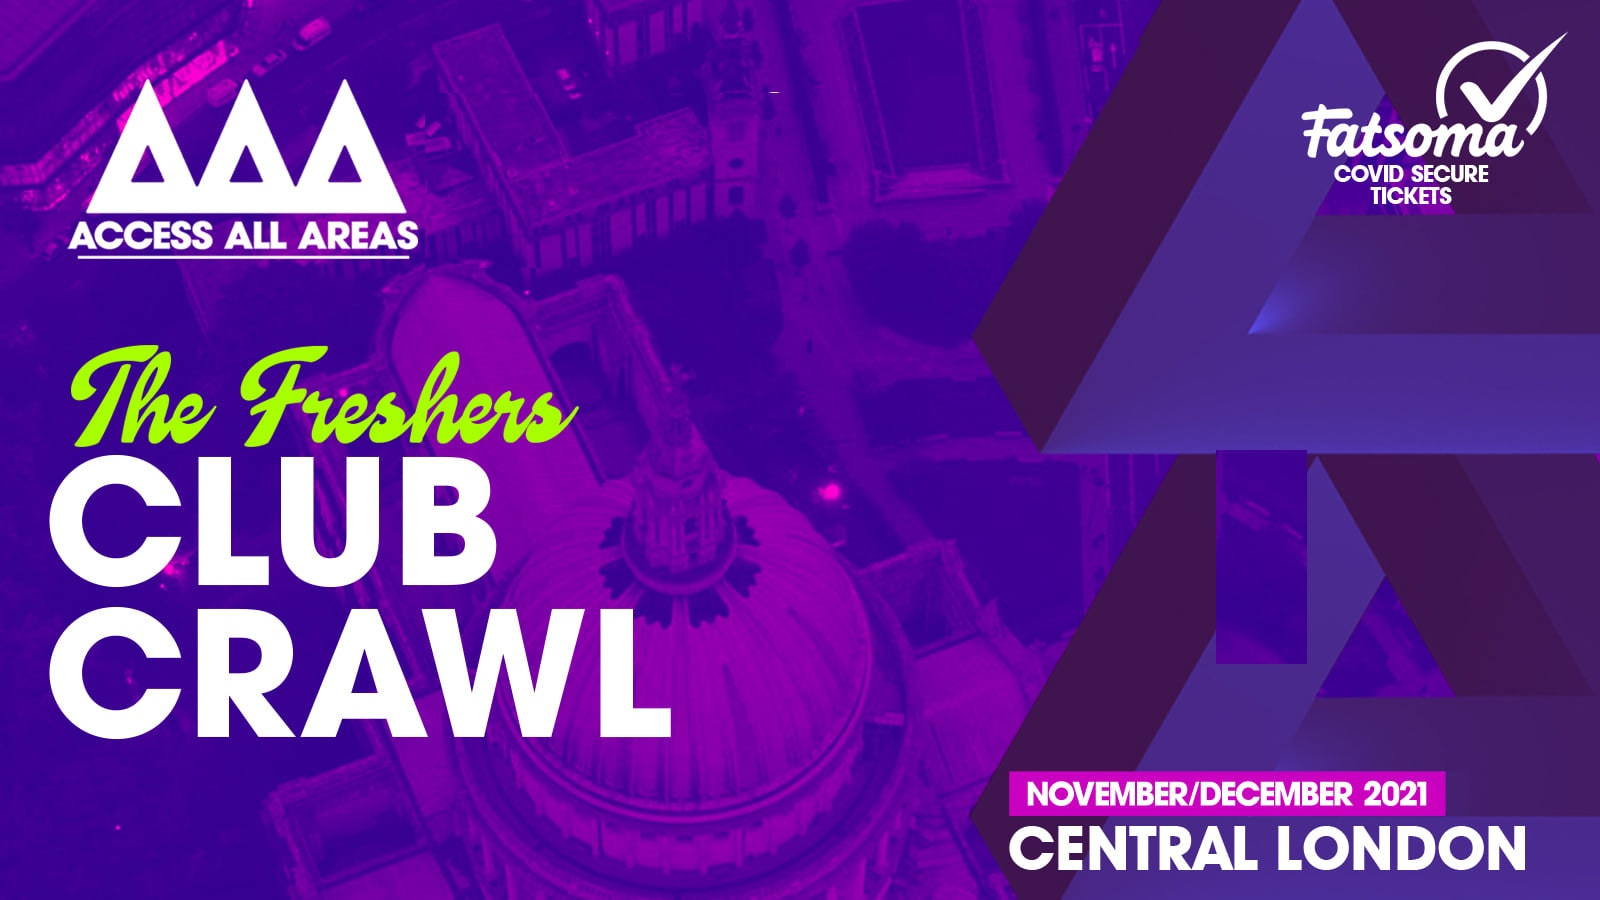 The Friday Night Freshers Club Crawl 🍻 November 27th 2021 💥